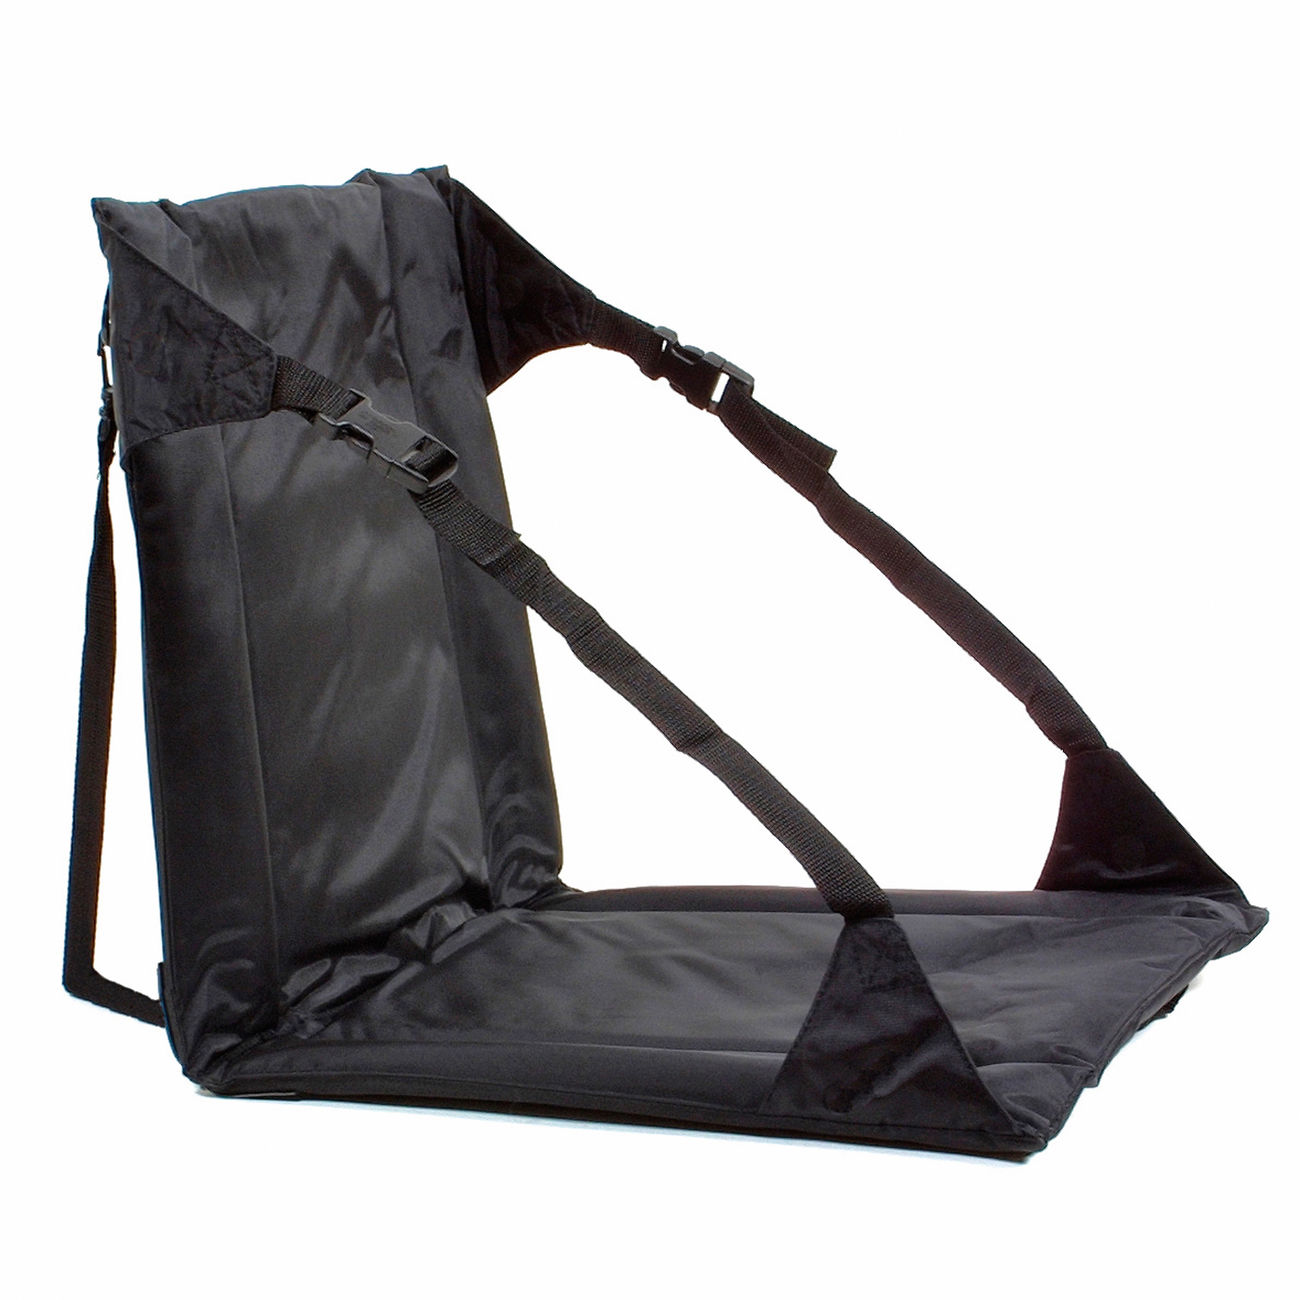 relags travelschair trail camping sitzkissen schwarz kotte zeller. Black Bedroom Furniture Sets. Home Design Ideas